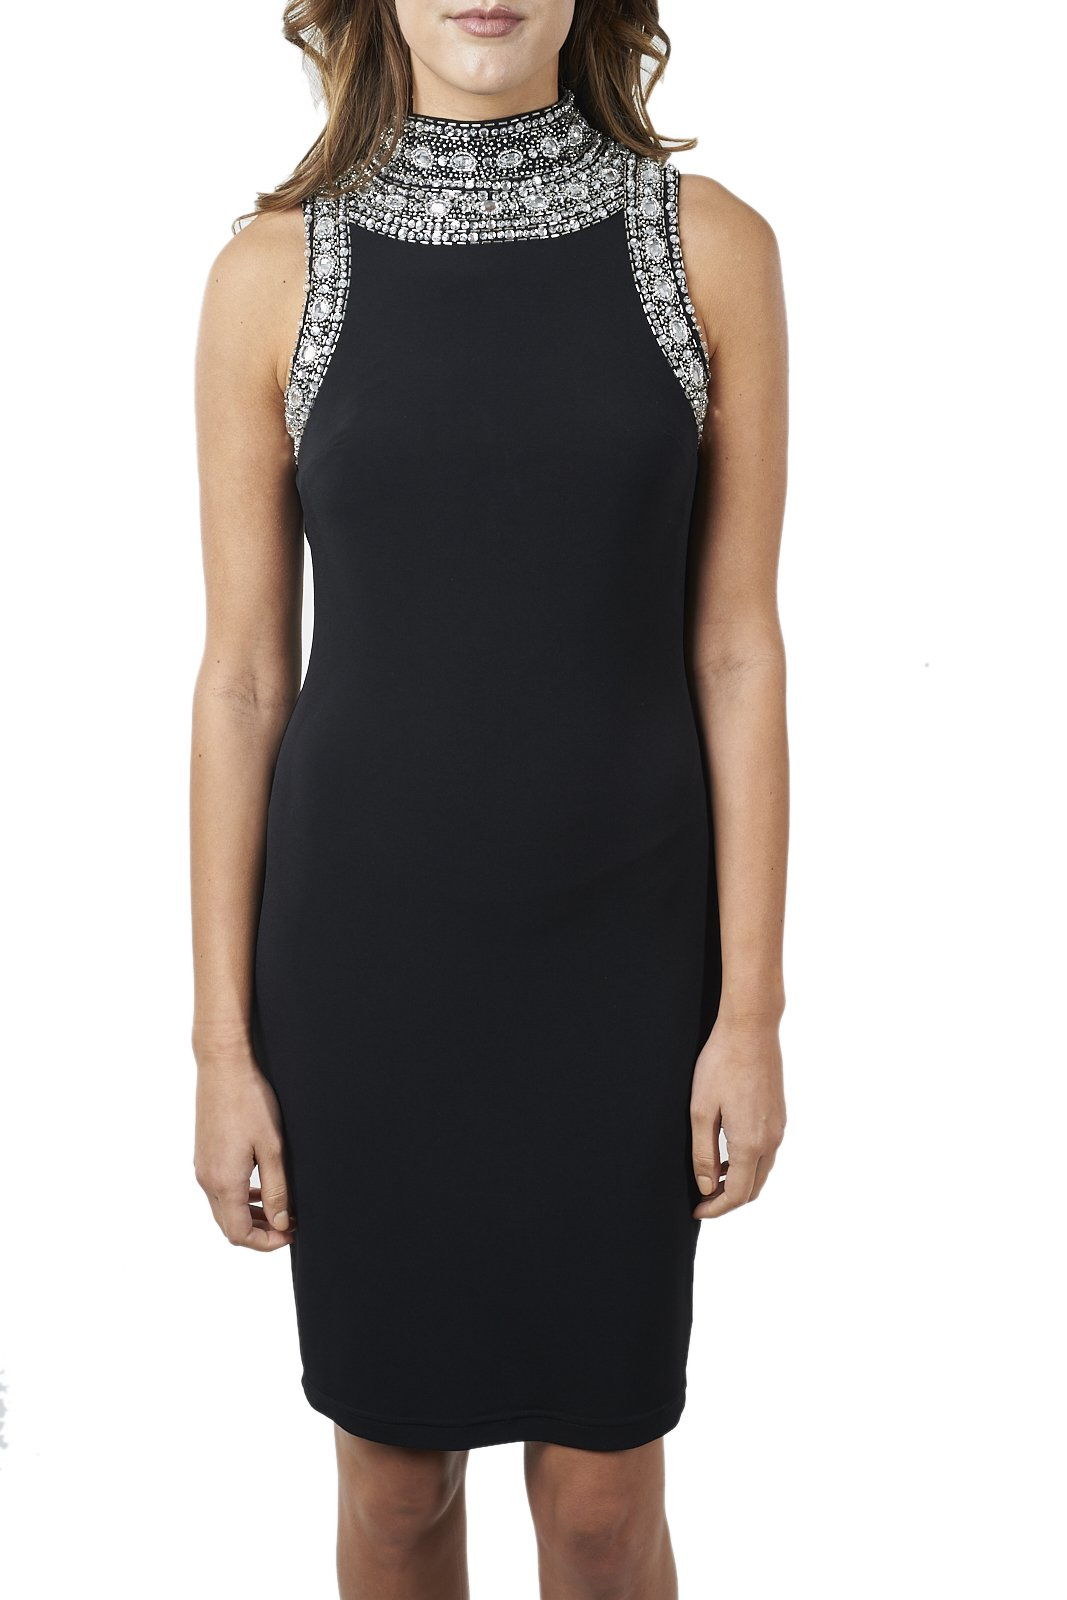 Joseph Ribkoff Black Sleeveless Jeweled Halter Neck Dress Style 171950 - Size 12 by Joseph Ribkoff